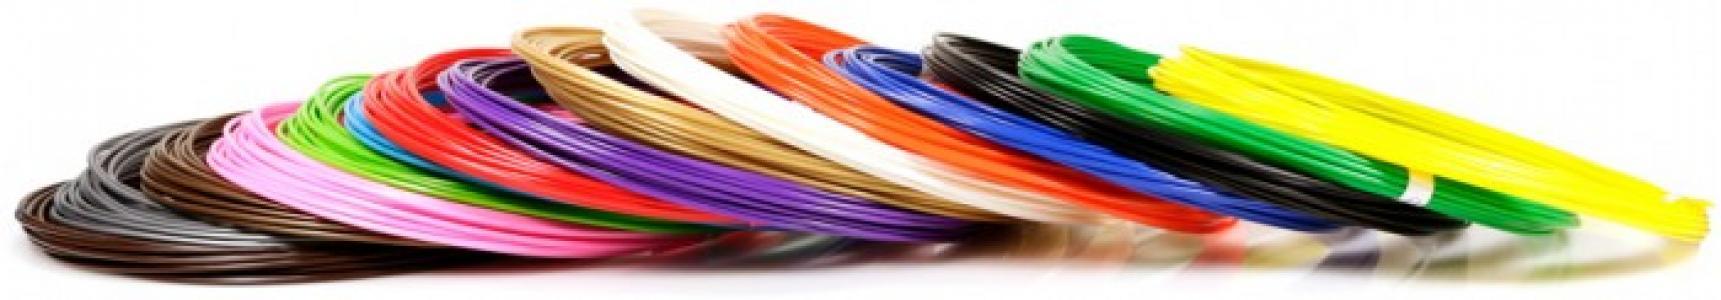 Комплект пластика ABS для 3Д ручек (15 цветов) Unid